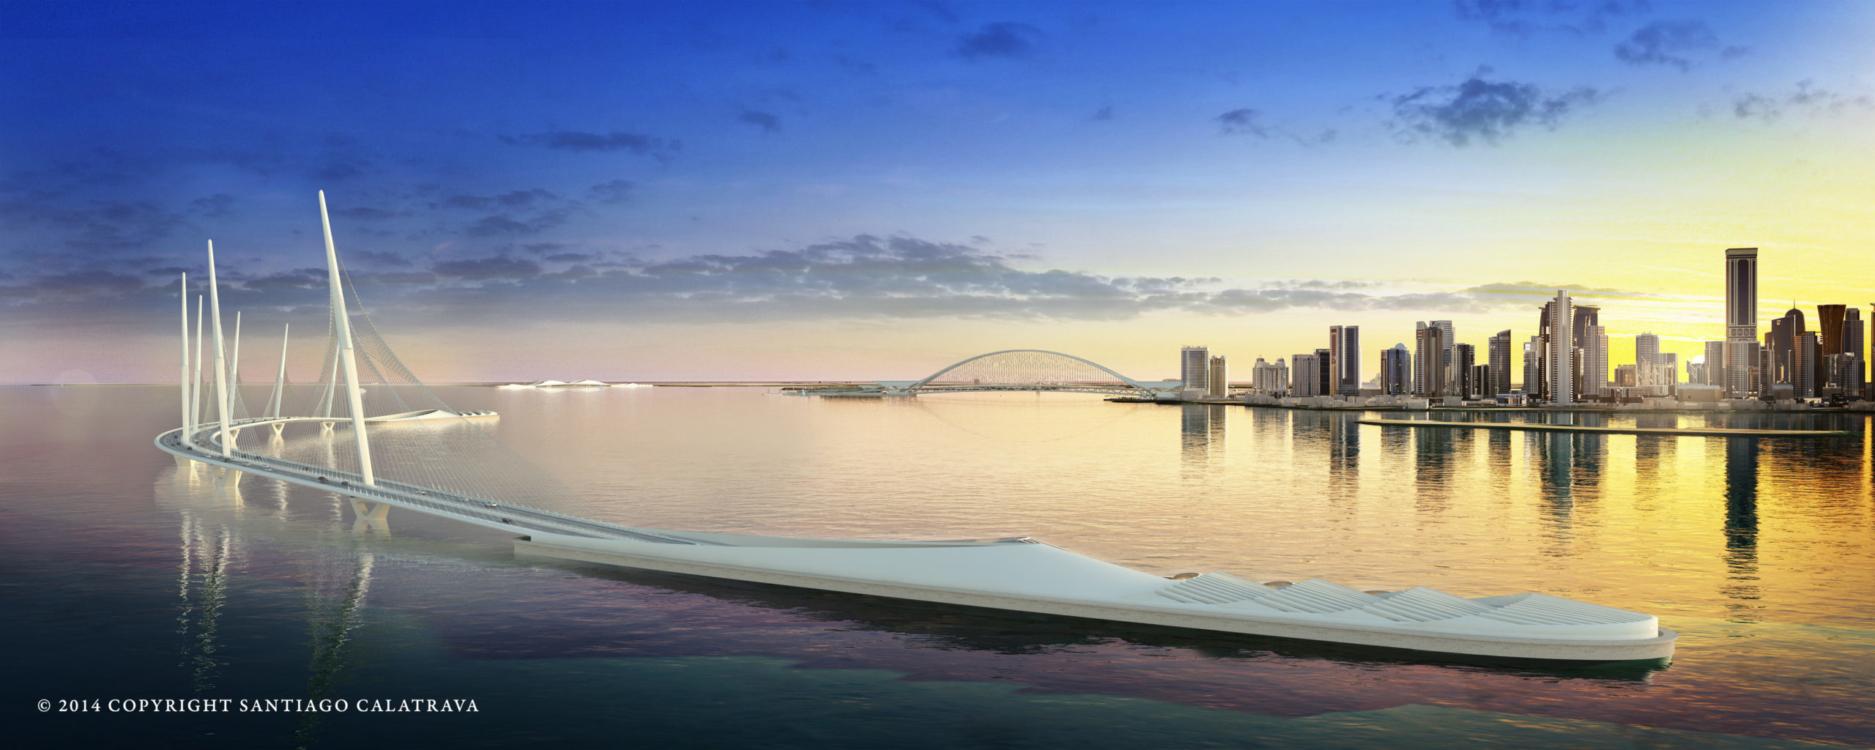 Qatar Doha Sharq Crossing, © Santiago Calatrava LLC